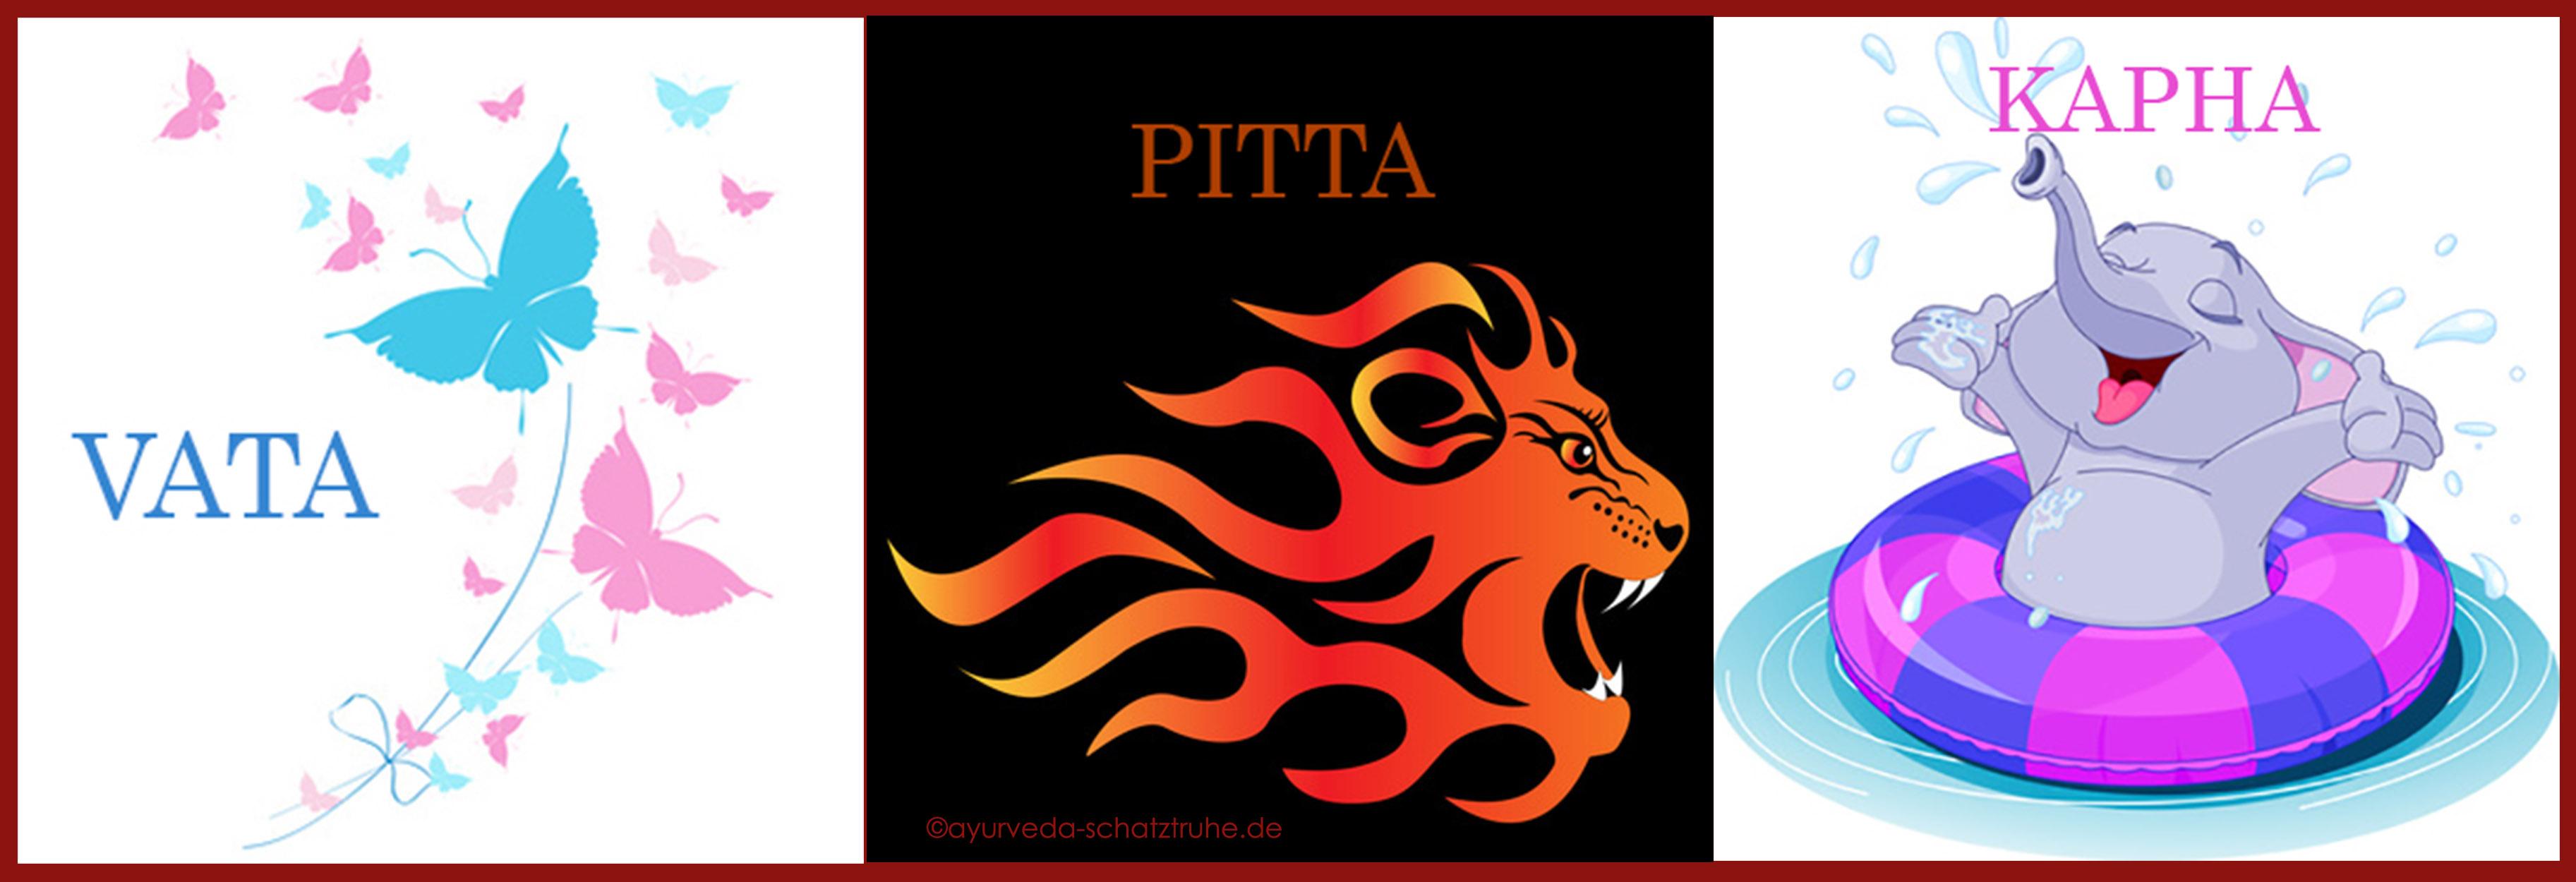 Die 3 Doshas: Vata, Pitta, Kapha